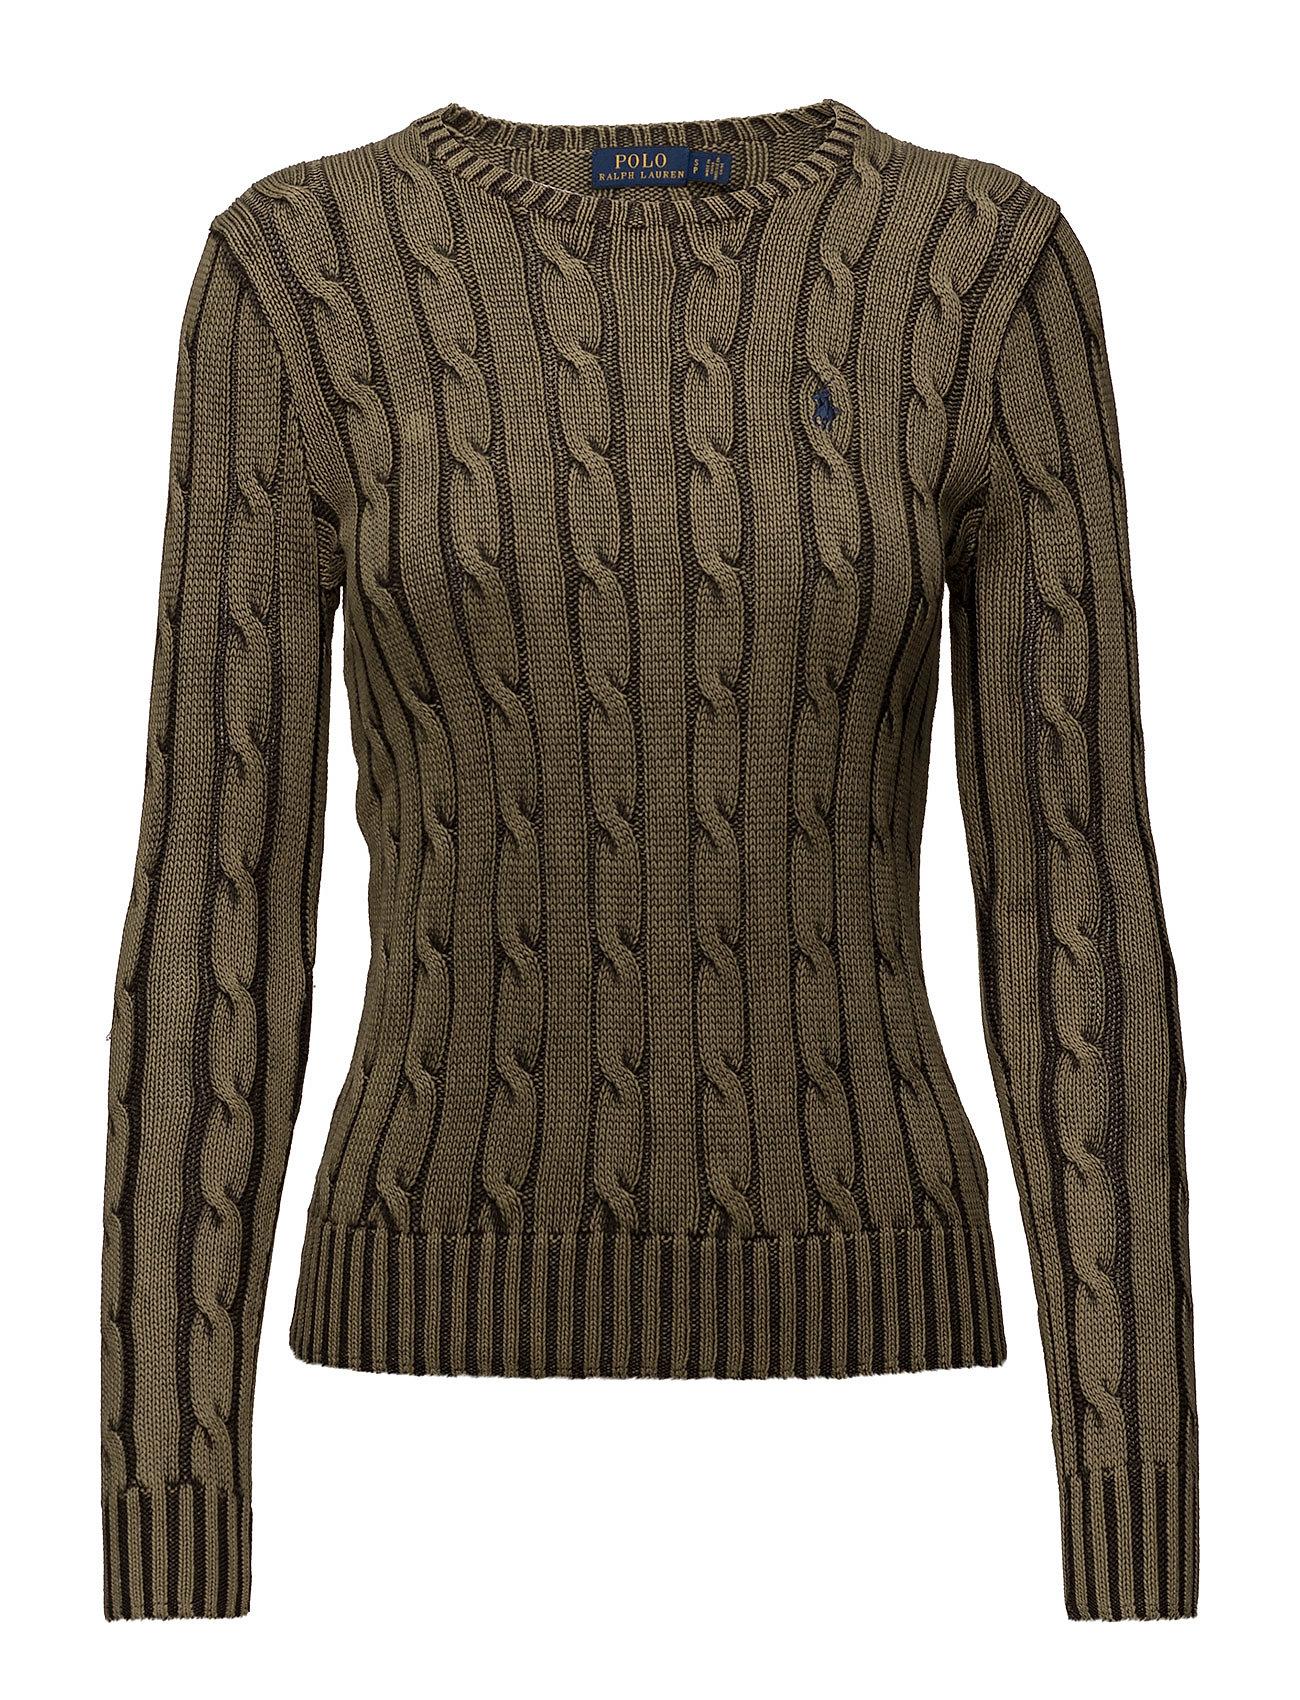 Polo Ralph Lauren Cable-Knit Crewneck Sweater